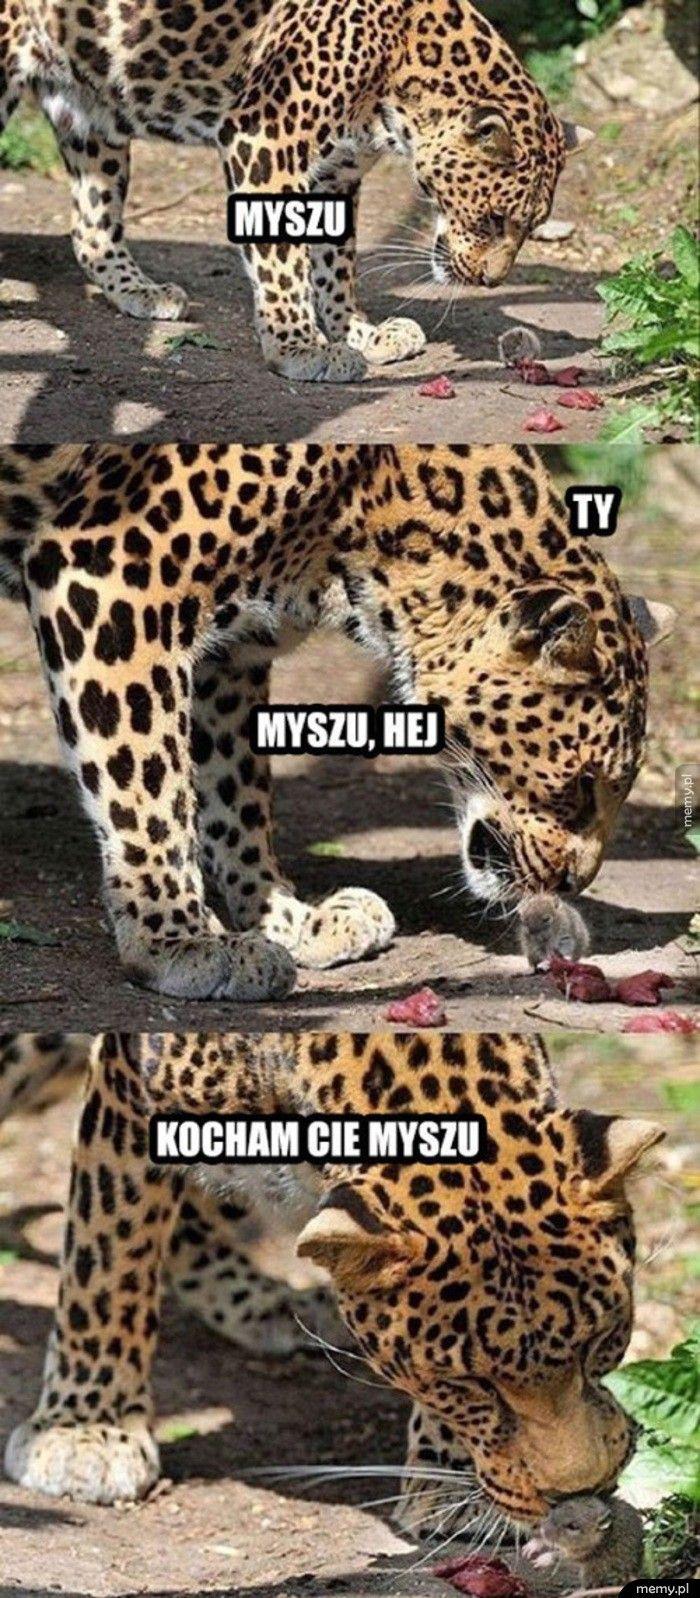 Myszu